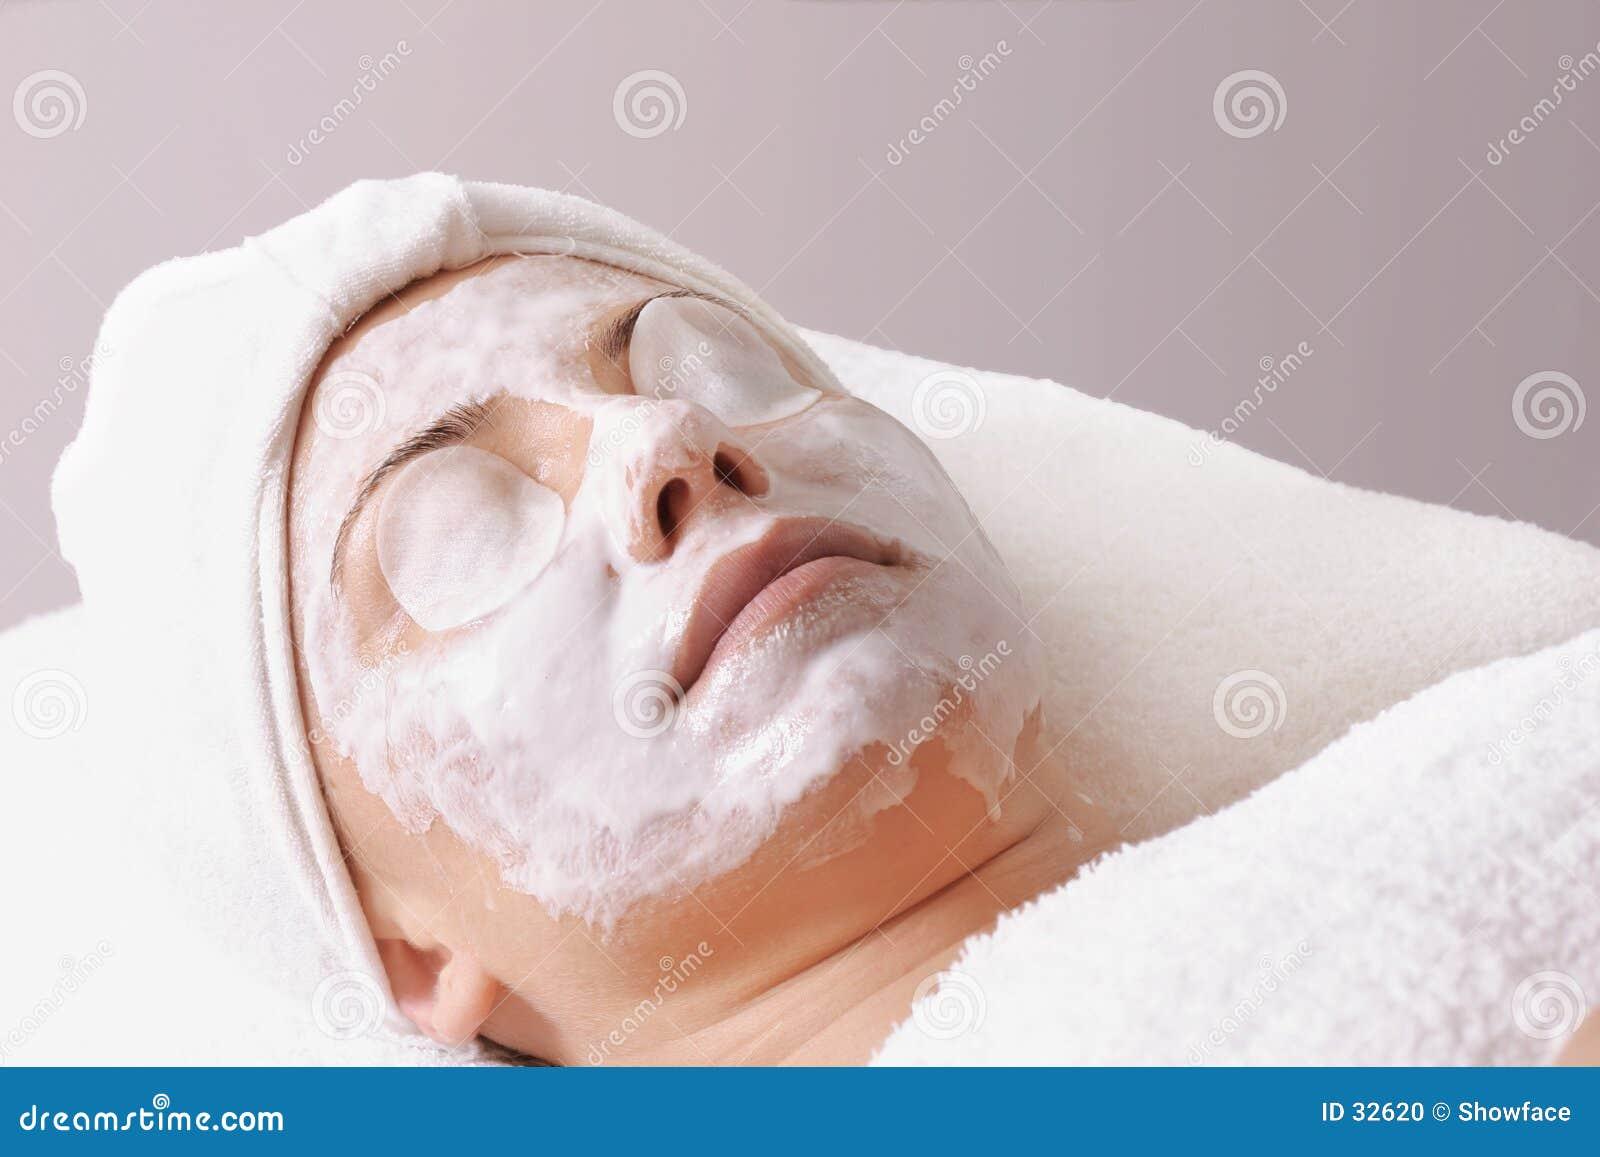 Salongbehandling